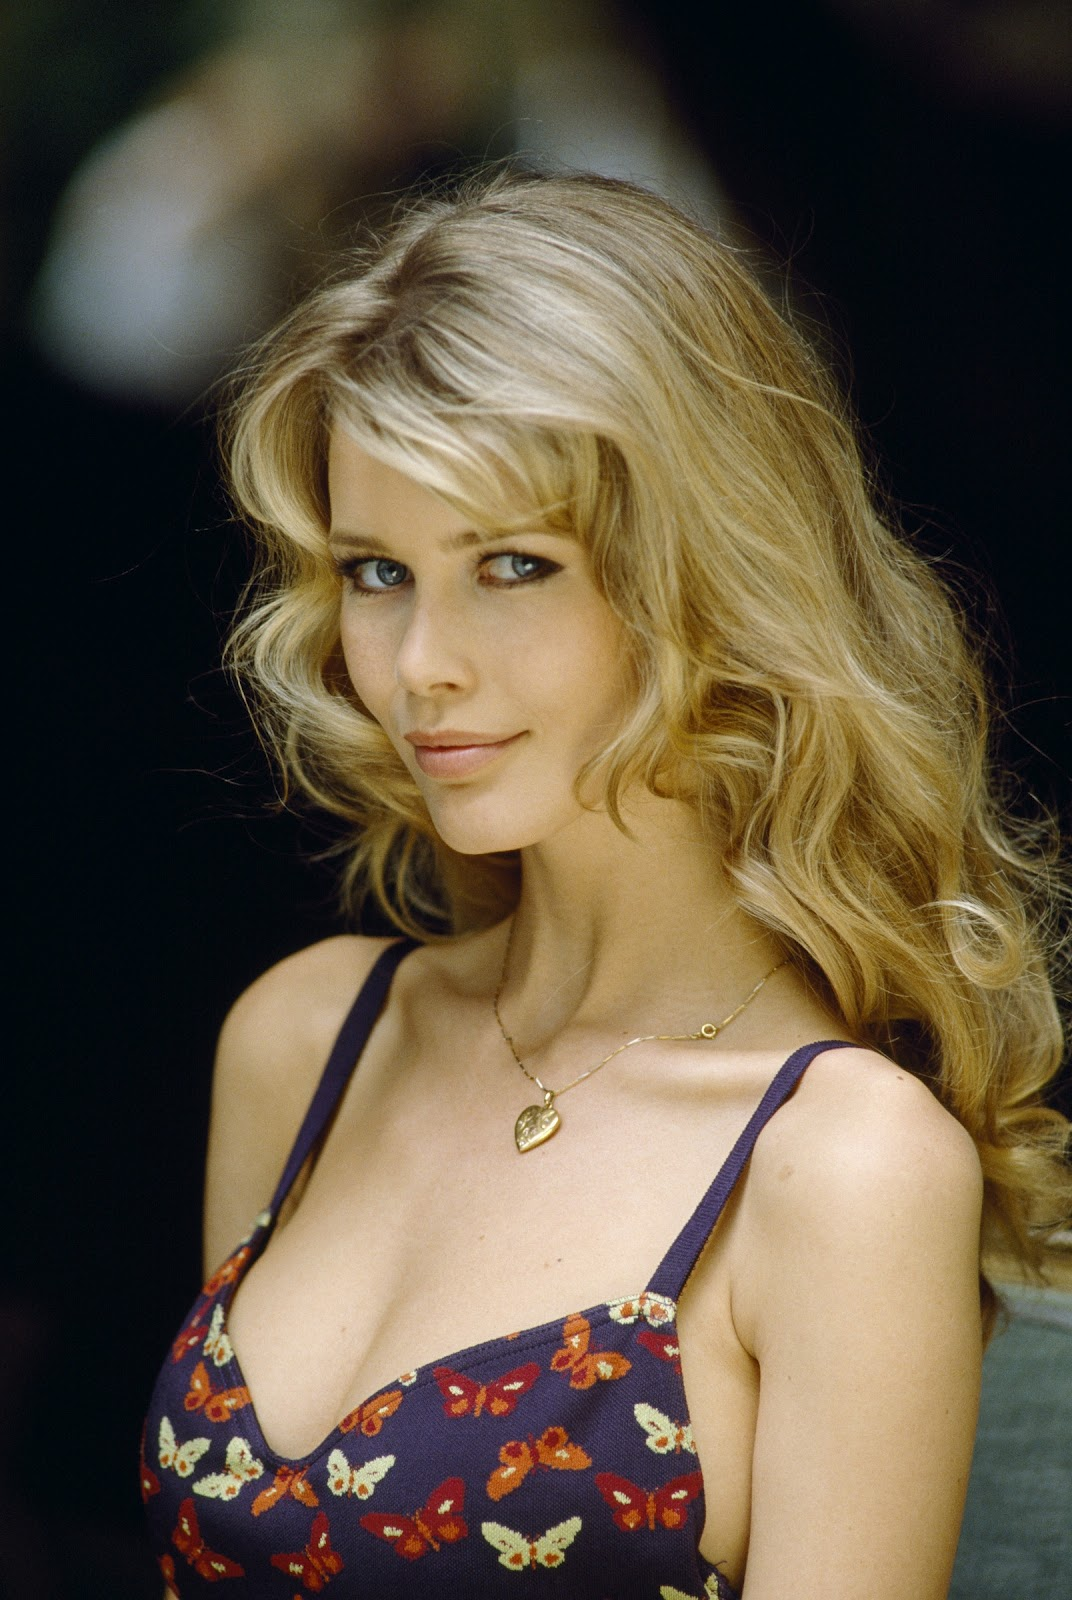 Models Camtv Supermodel Claudia Schiffer Hot Random Pic